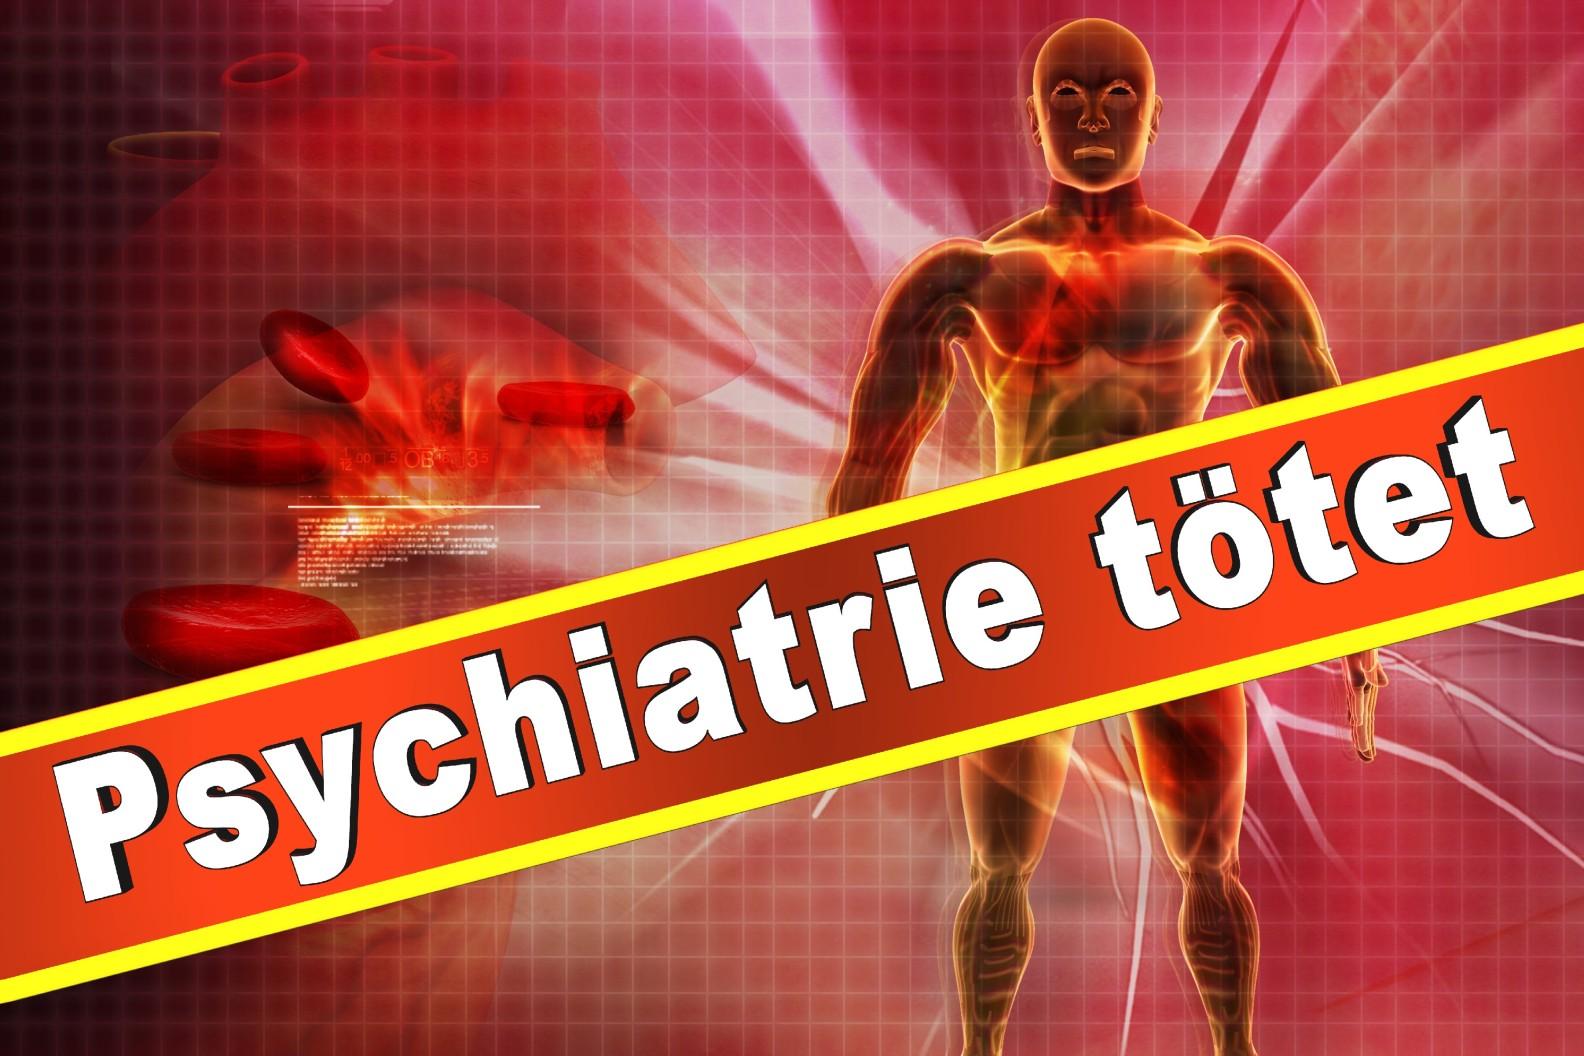 SHK GGmbH Psychiatrisch Psychotherapeutische